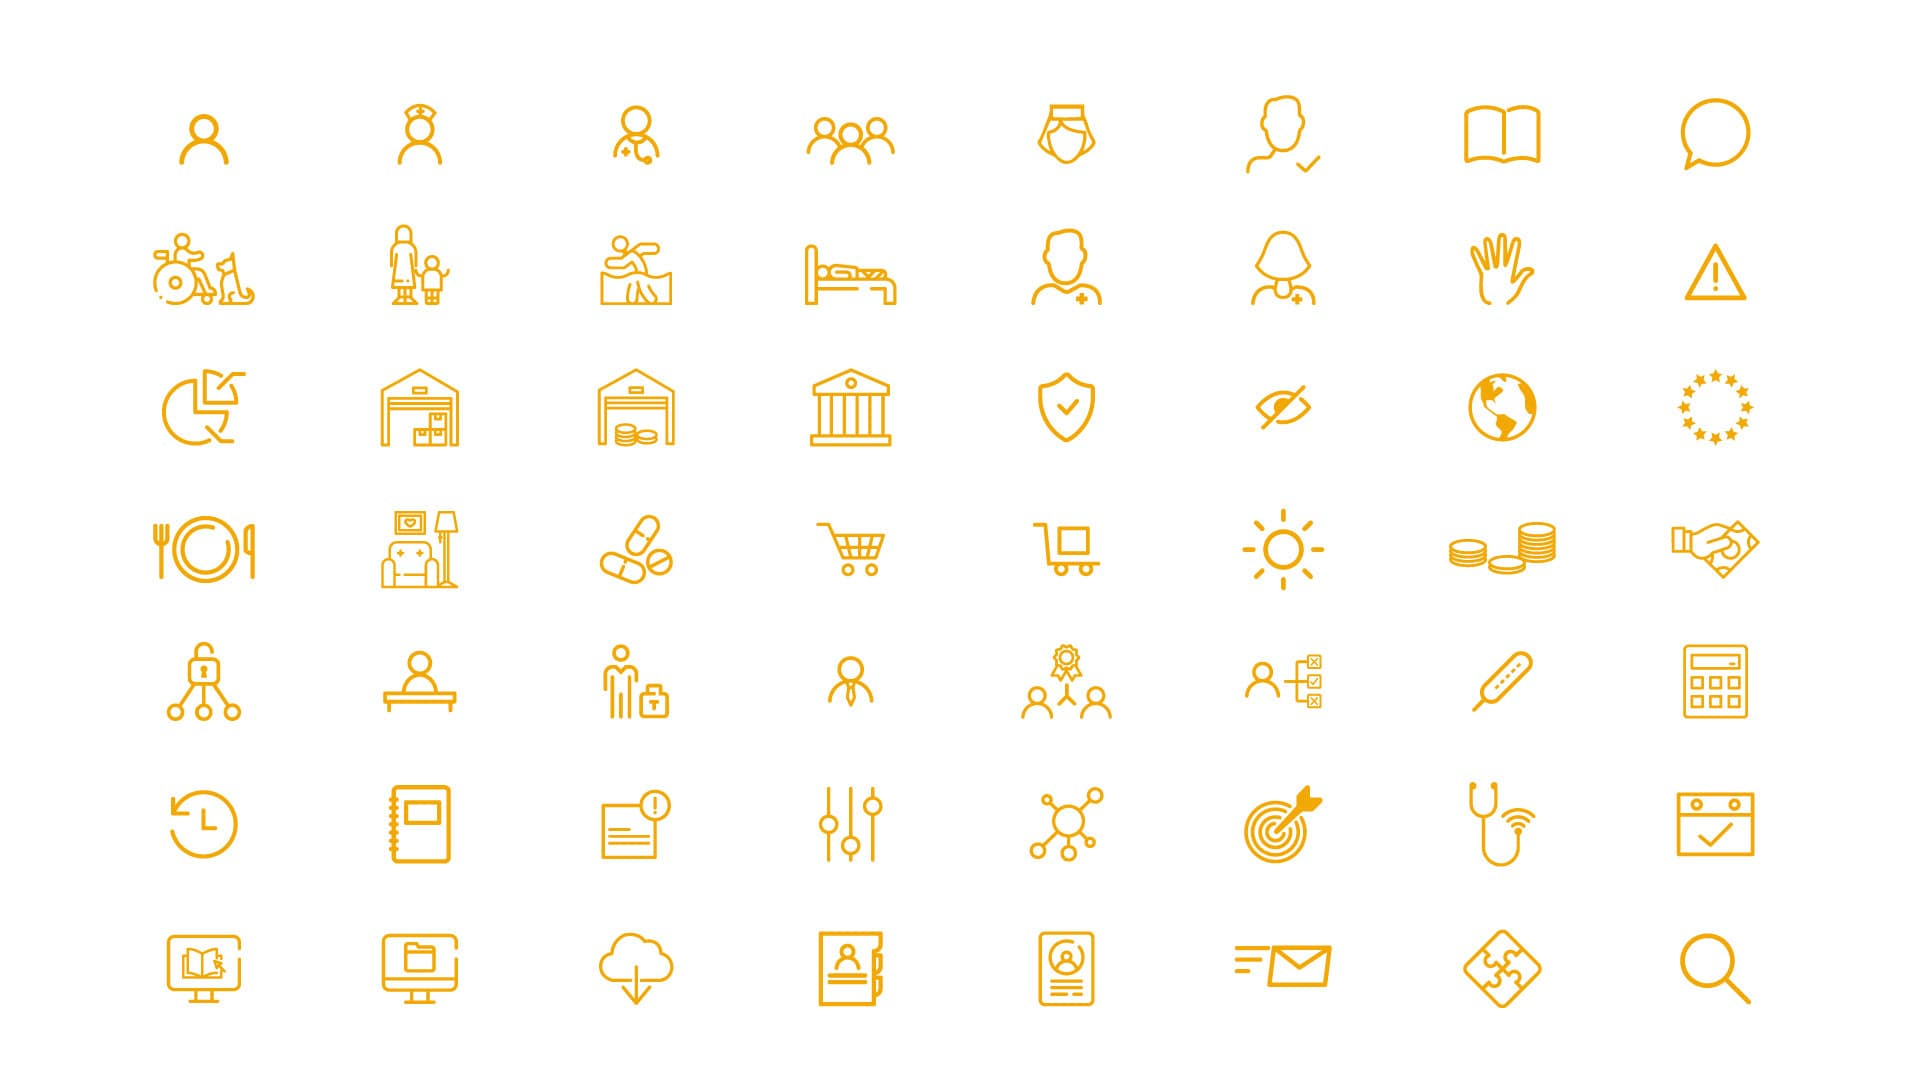 Softwareuno icons